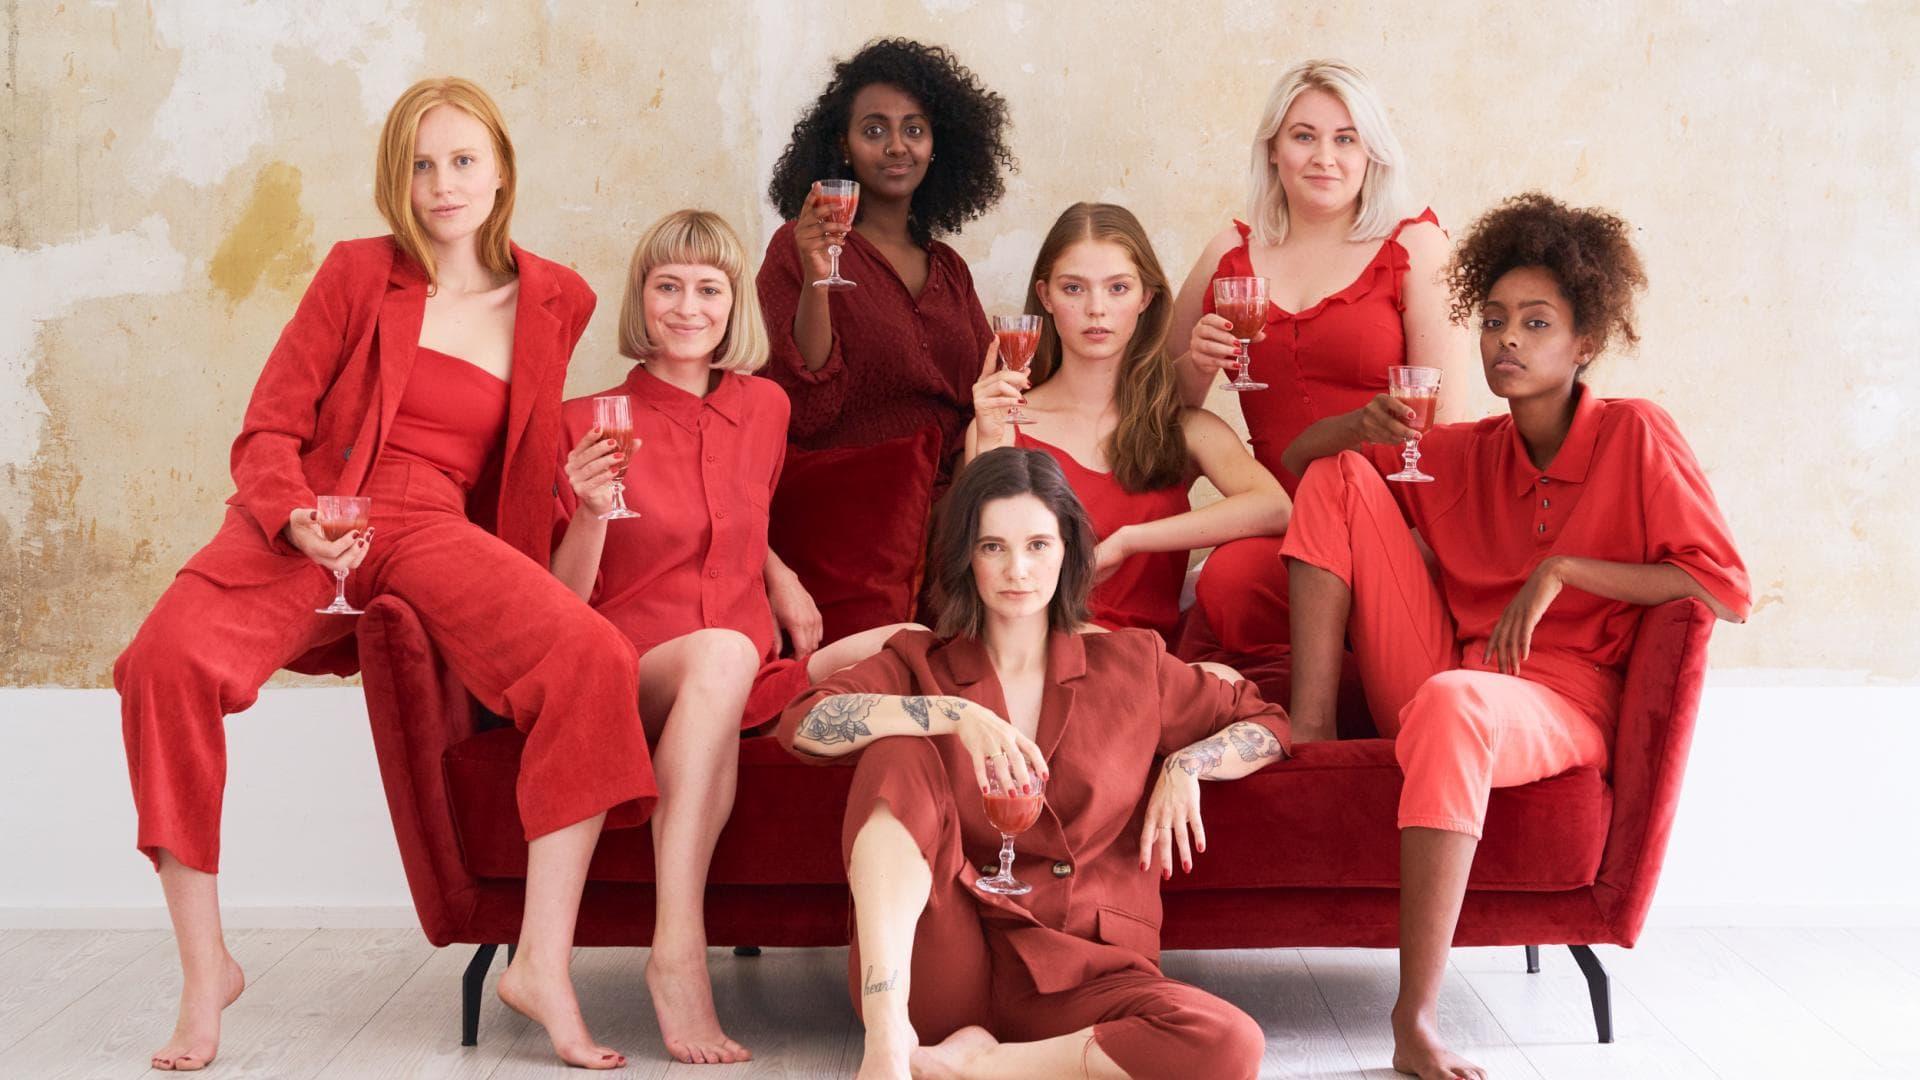 Team Female Company